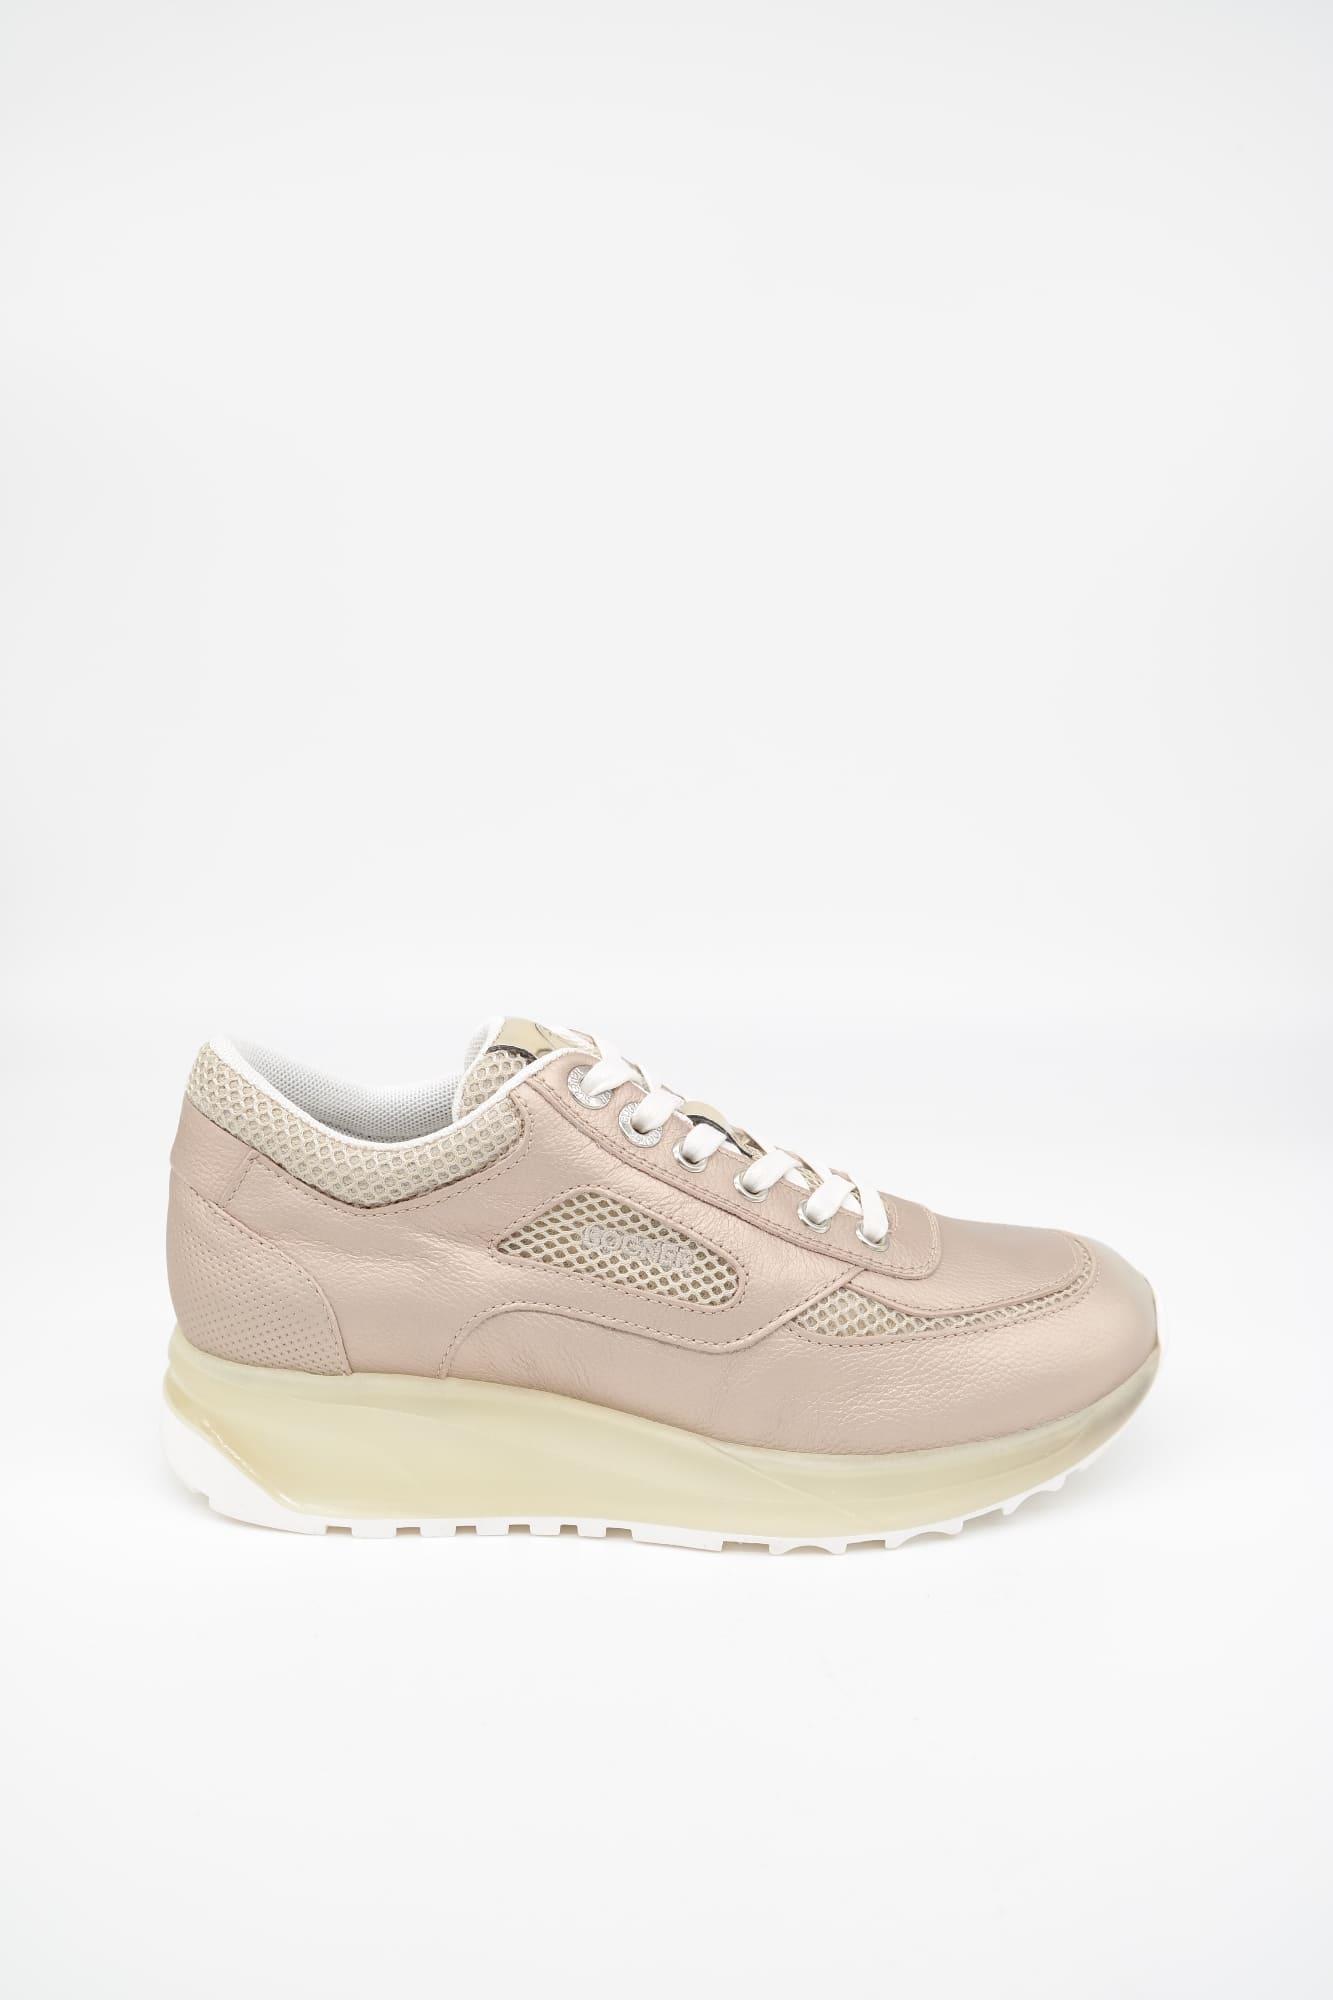 BOGNER New York Lady 10 Damen Sneaker Schuhe, Size: 37 EU / Champagne Leder